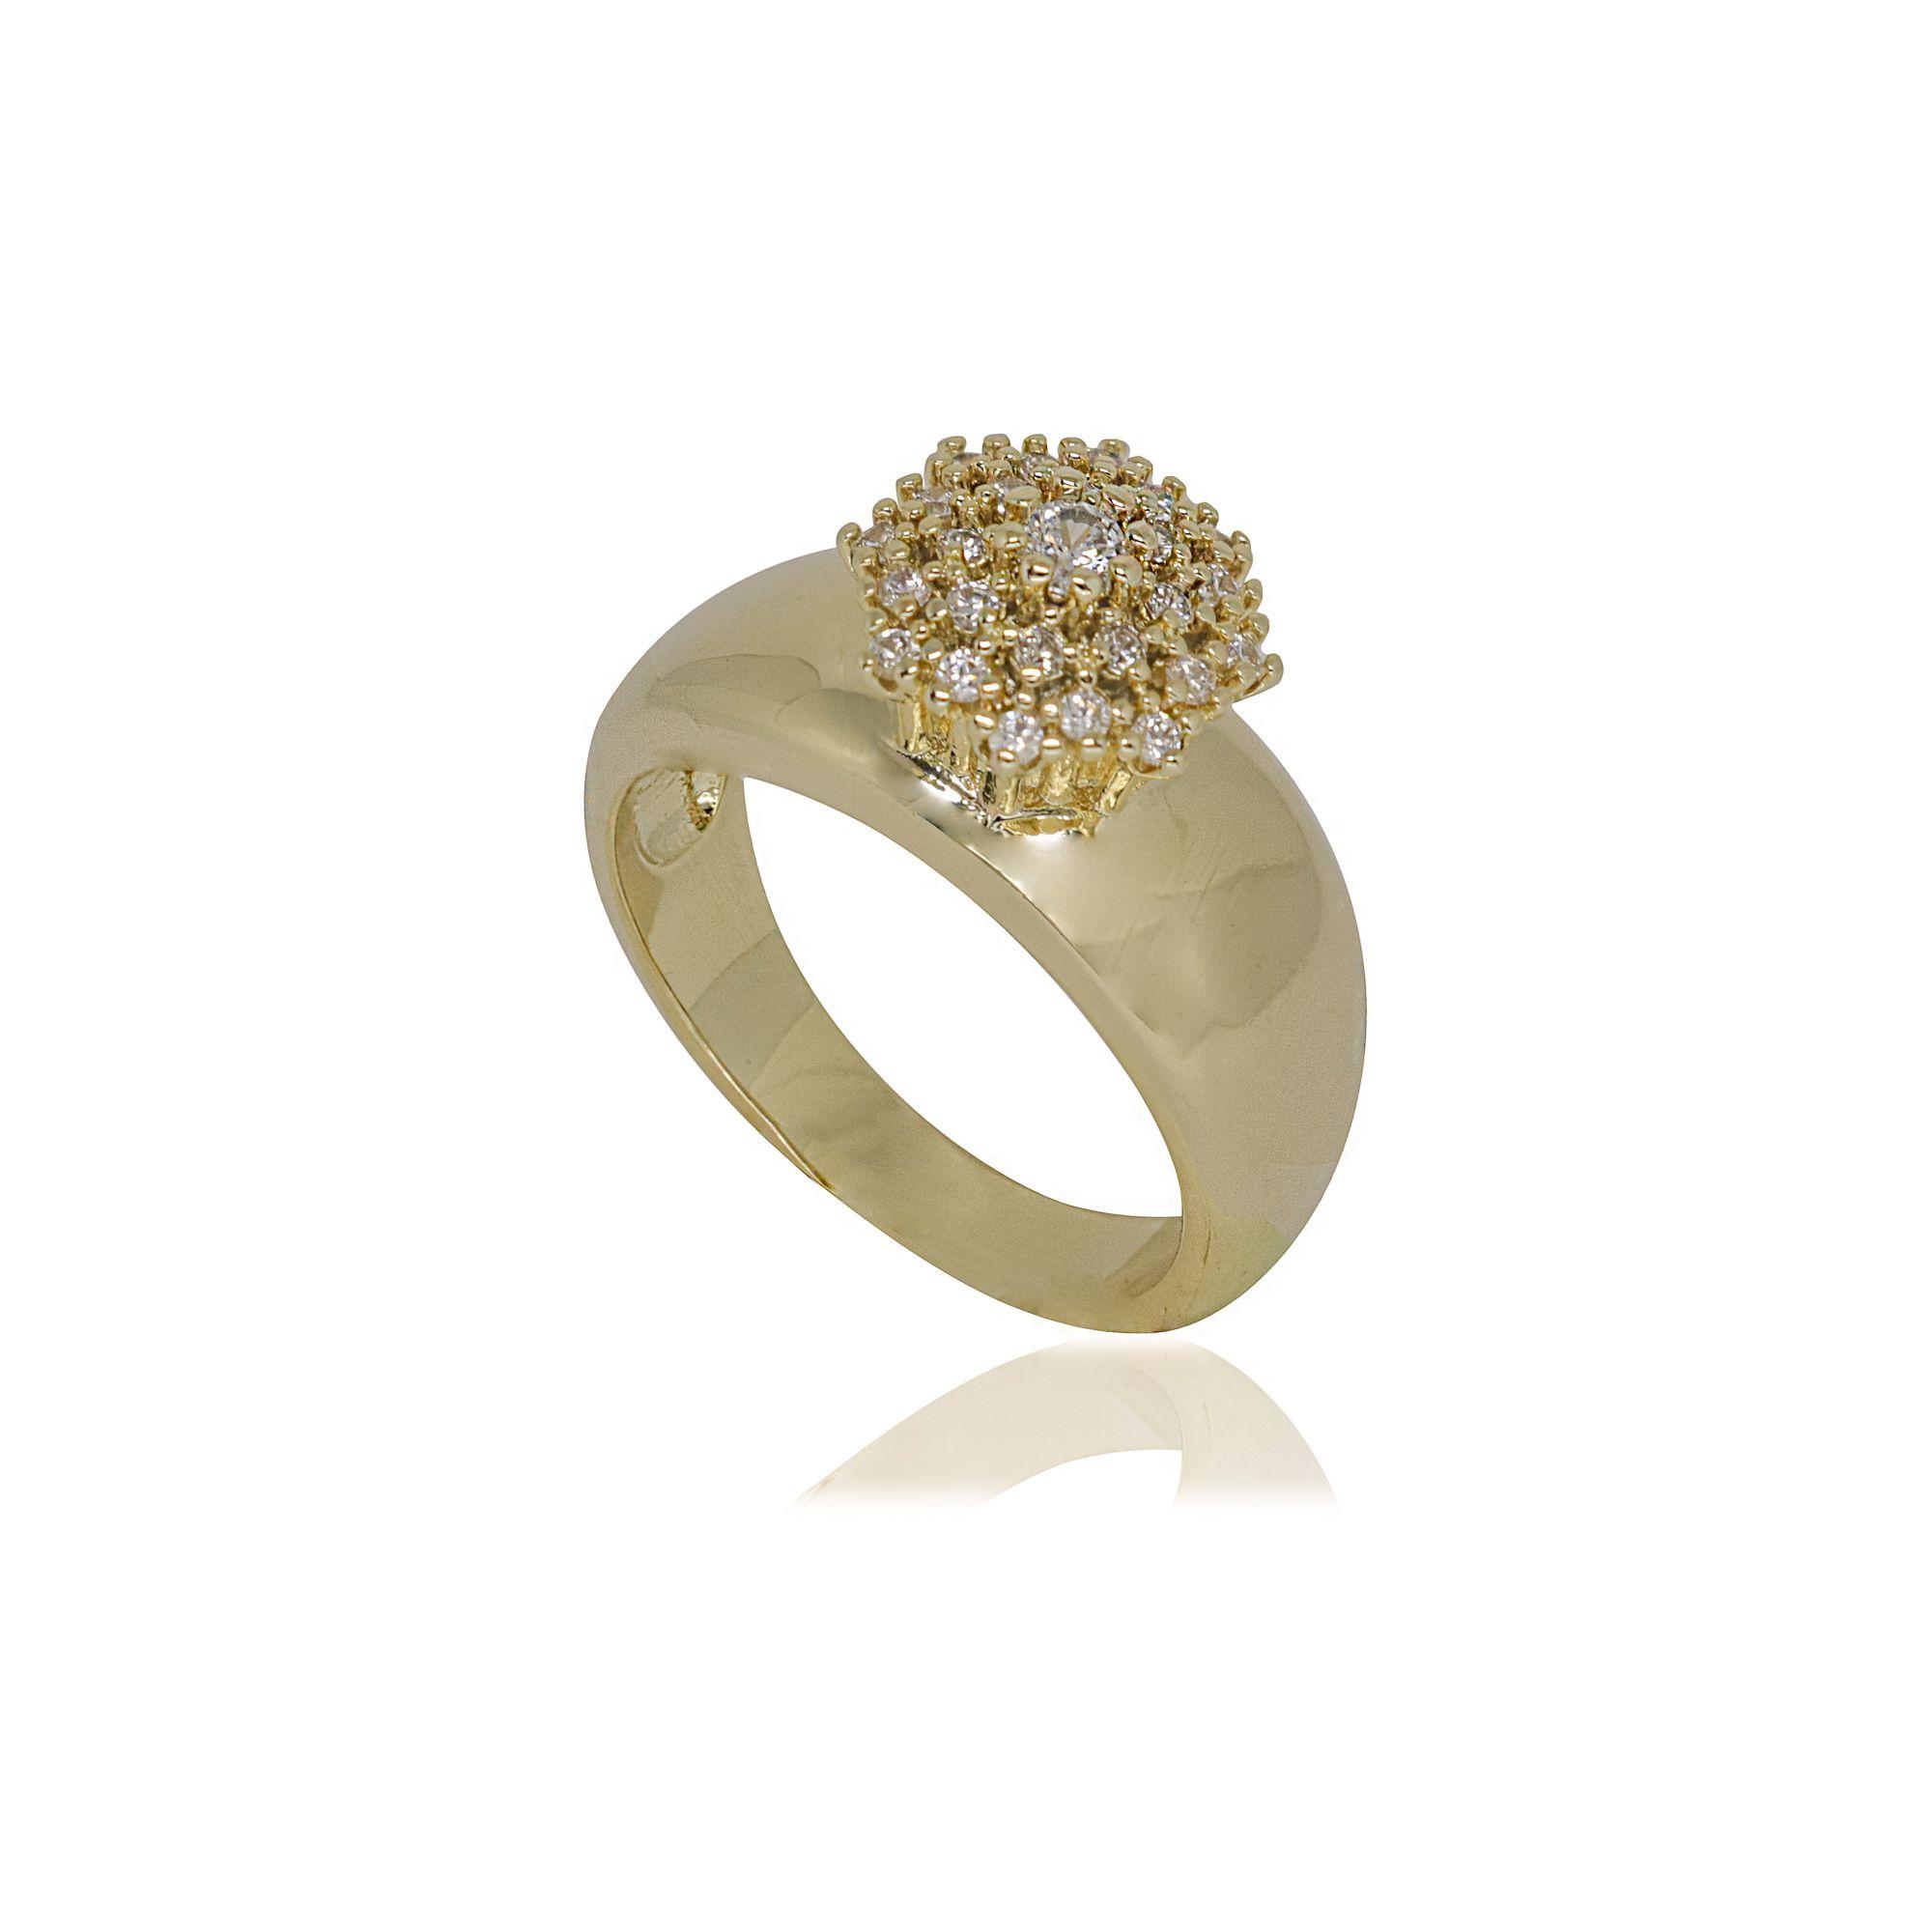 Anel Semi joia largo chuveirinho banhado a ouro 18k ou rhodium